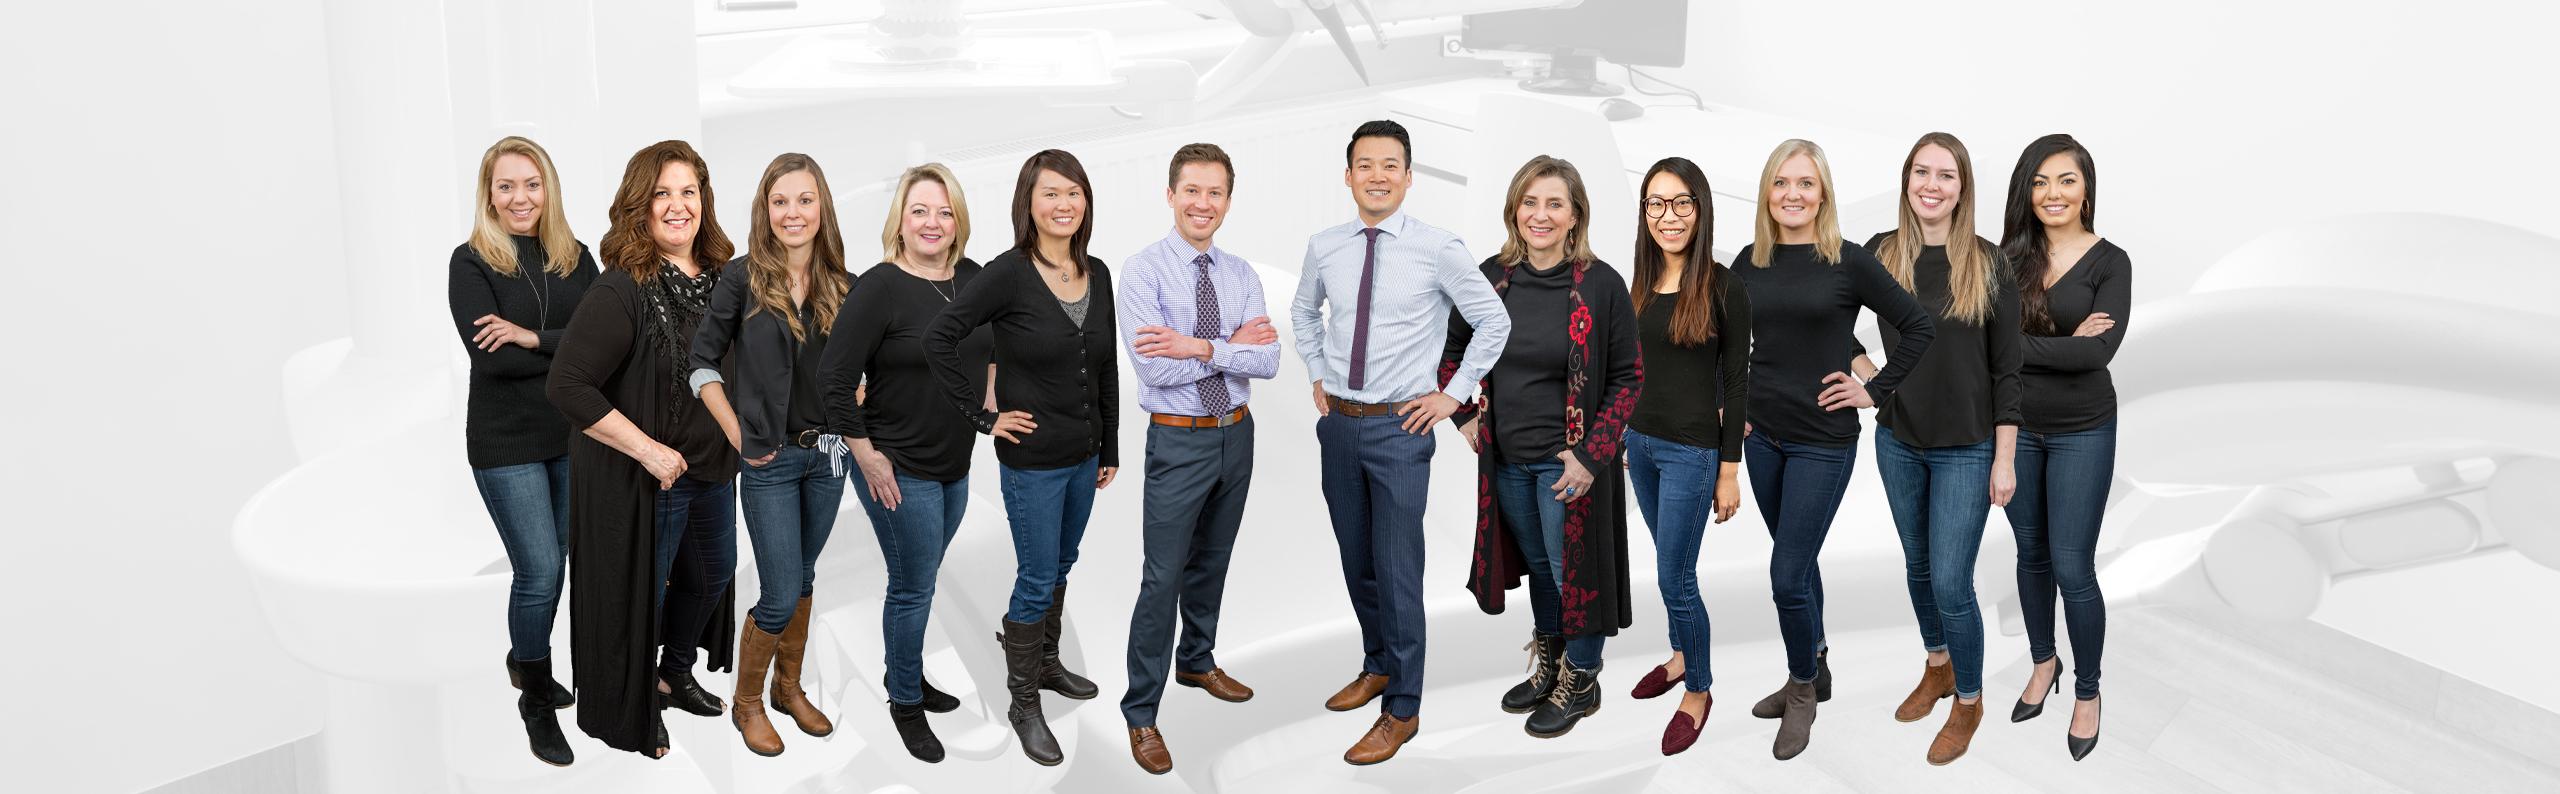 Calgary dentist and his team